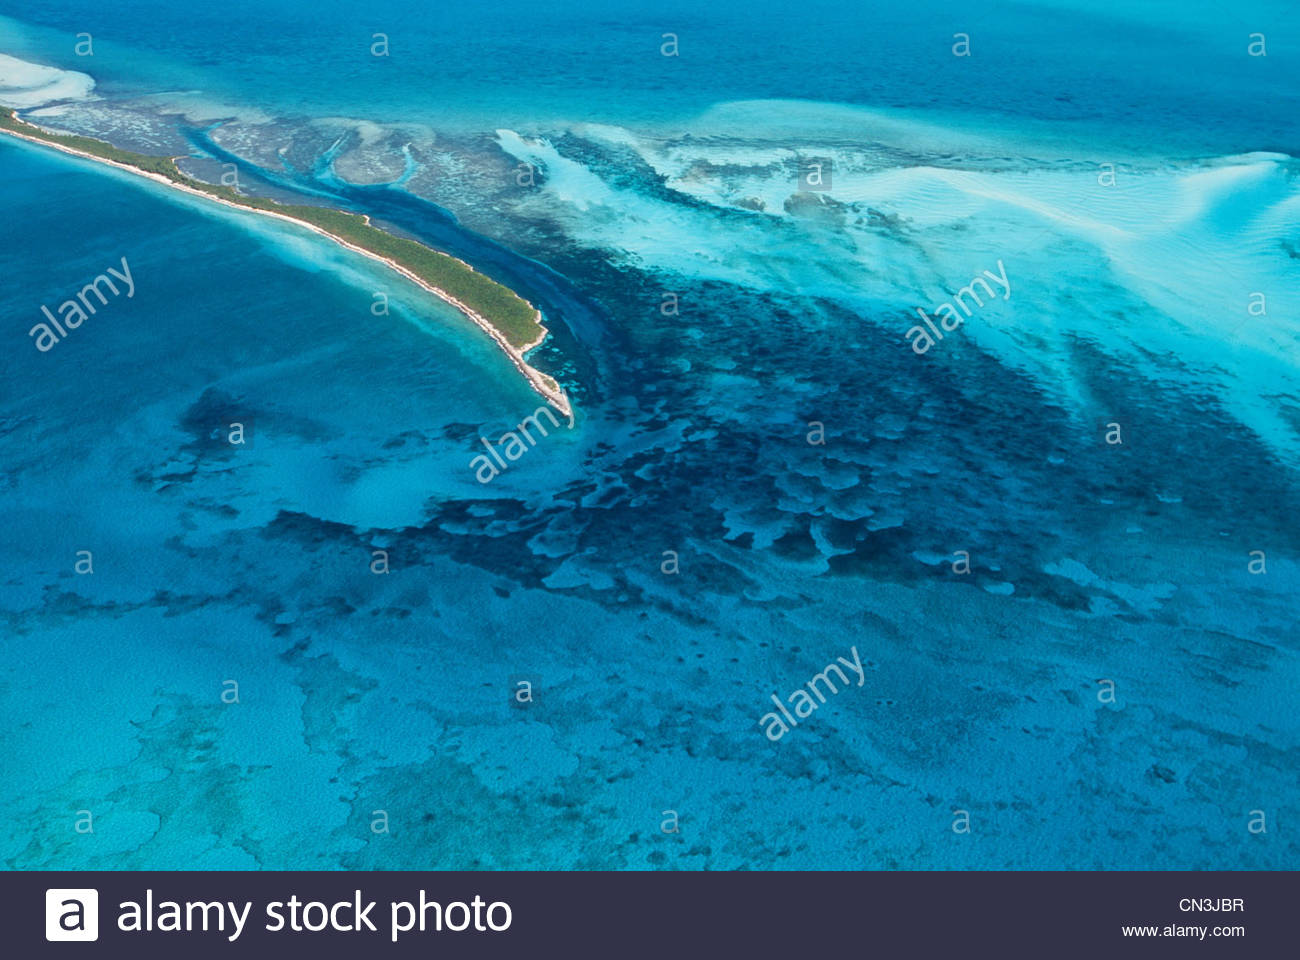 Antenne, Bimini Islands, Great Bahamas Bank, Bahamas Stockbild